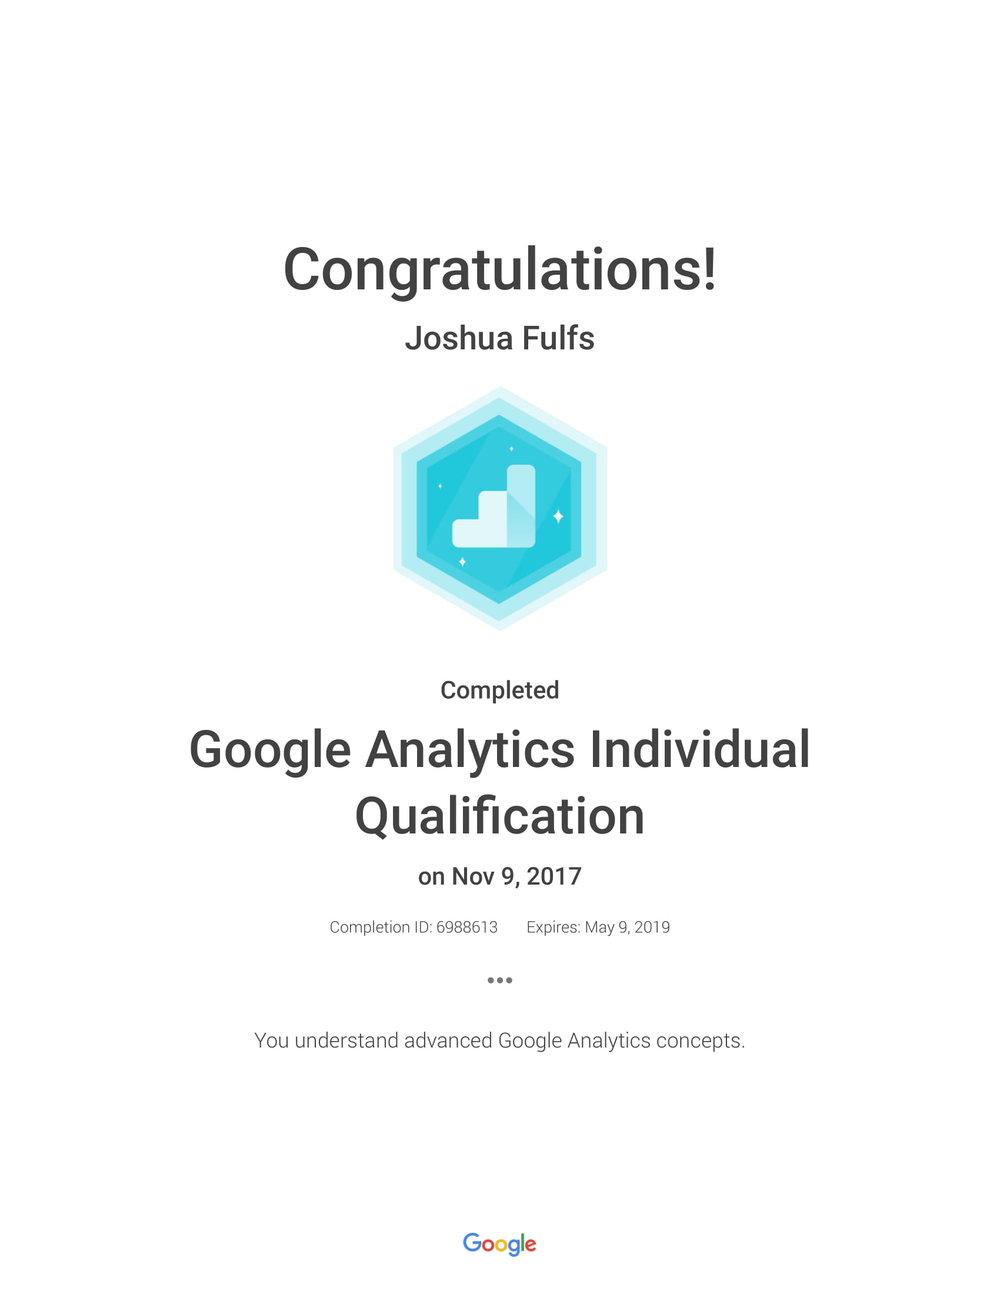 Google Analytics Individual Qualification_ Academy for Ads_Joshua Fulfs.jpg